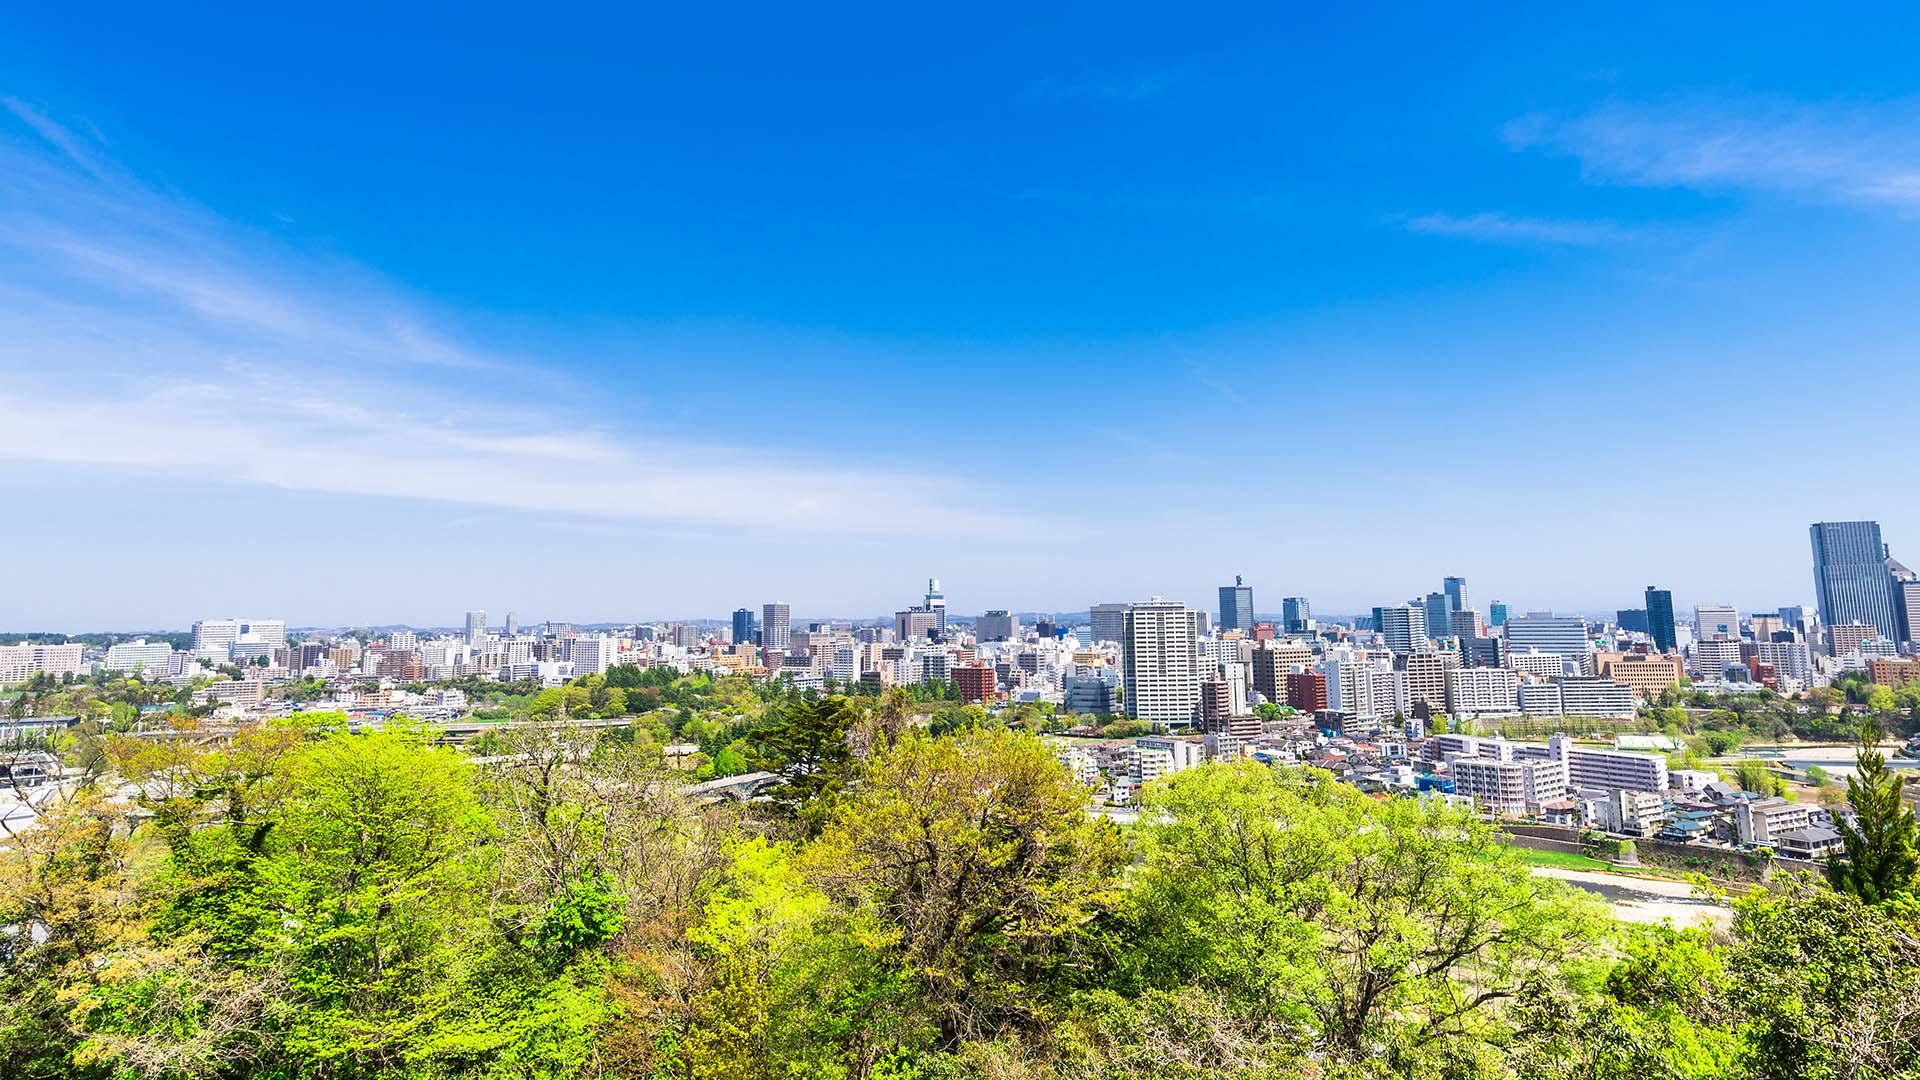 仙台 | Sendai City